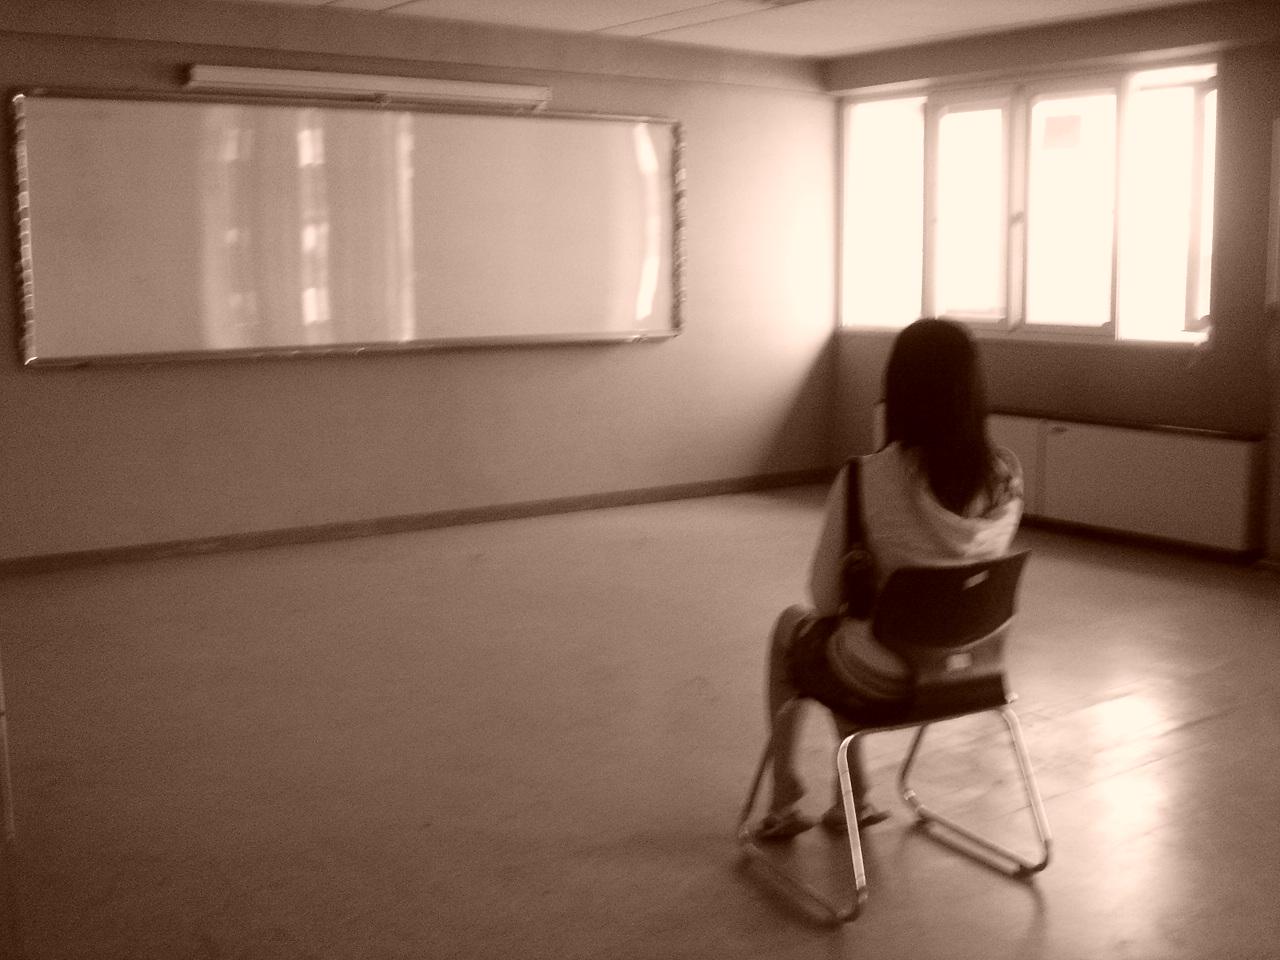 empty classroom with teacher - photo #33